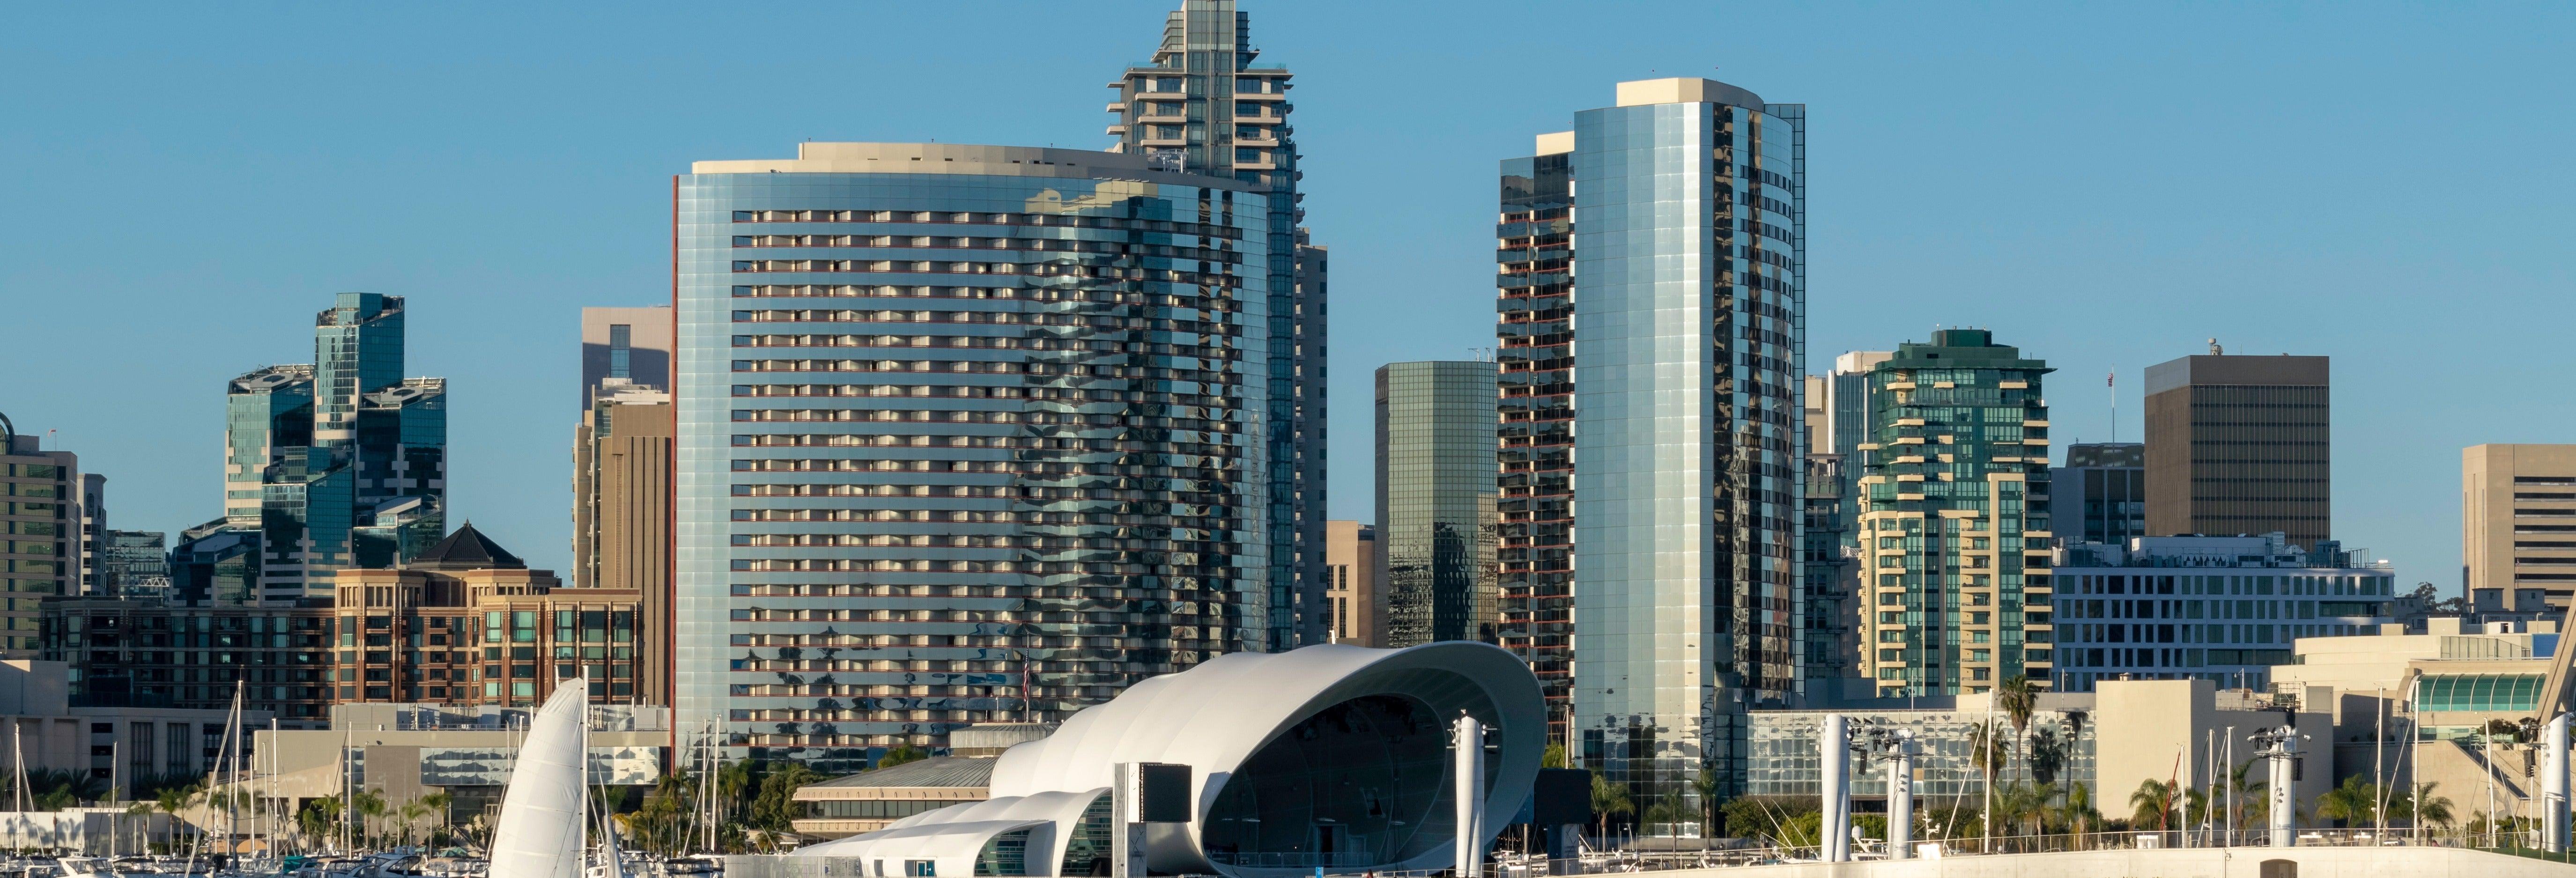 Escursione a San Diego